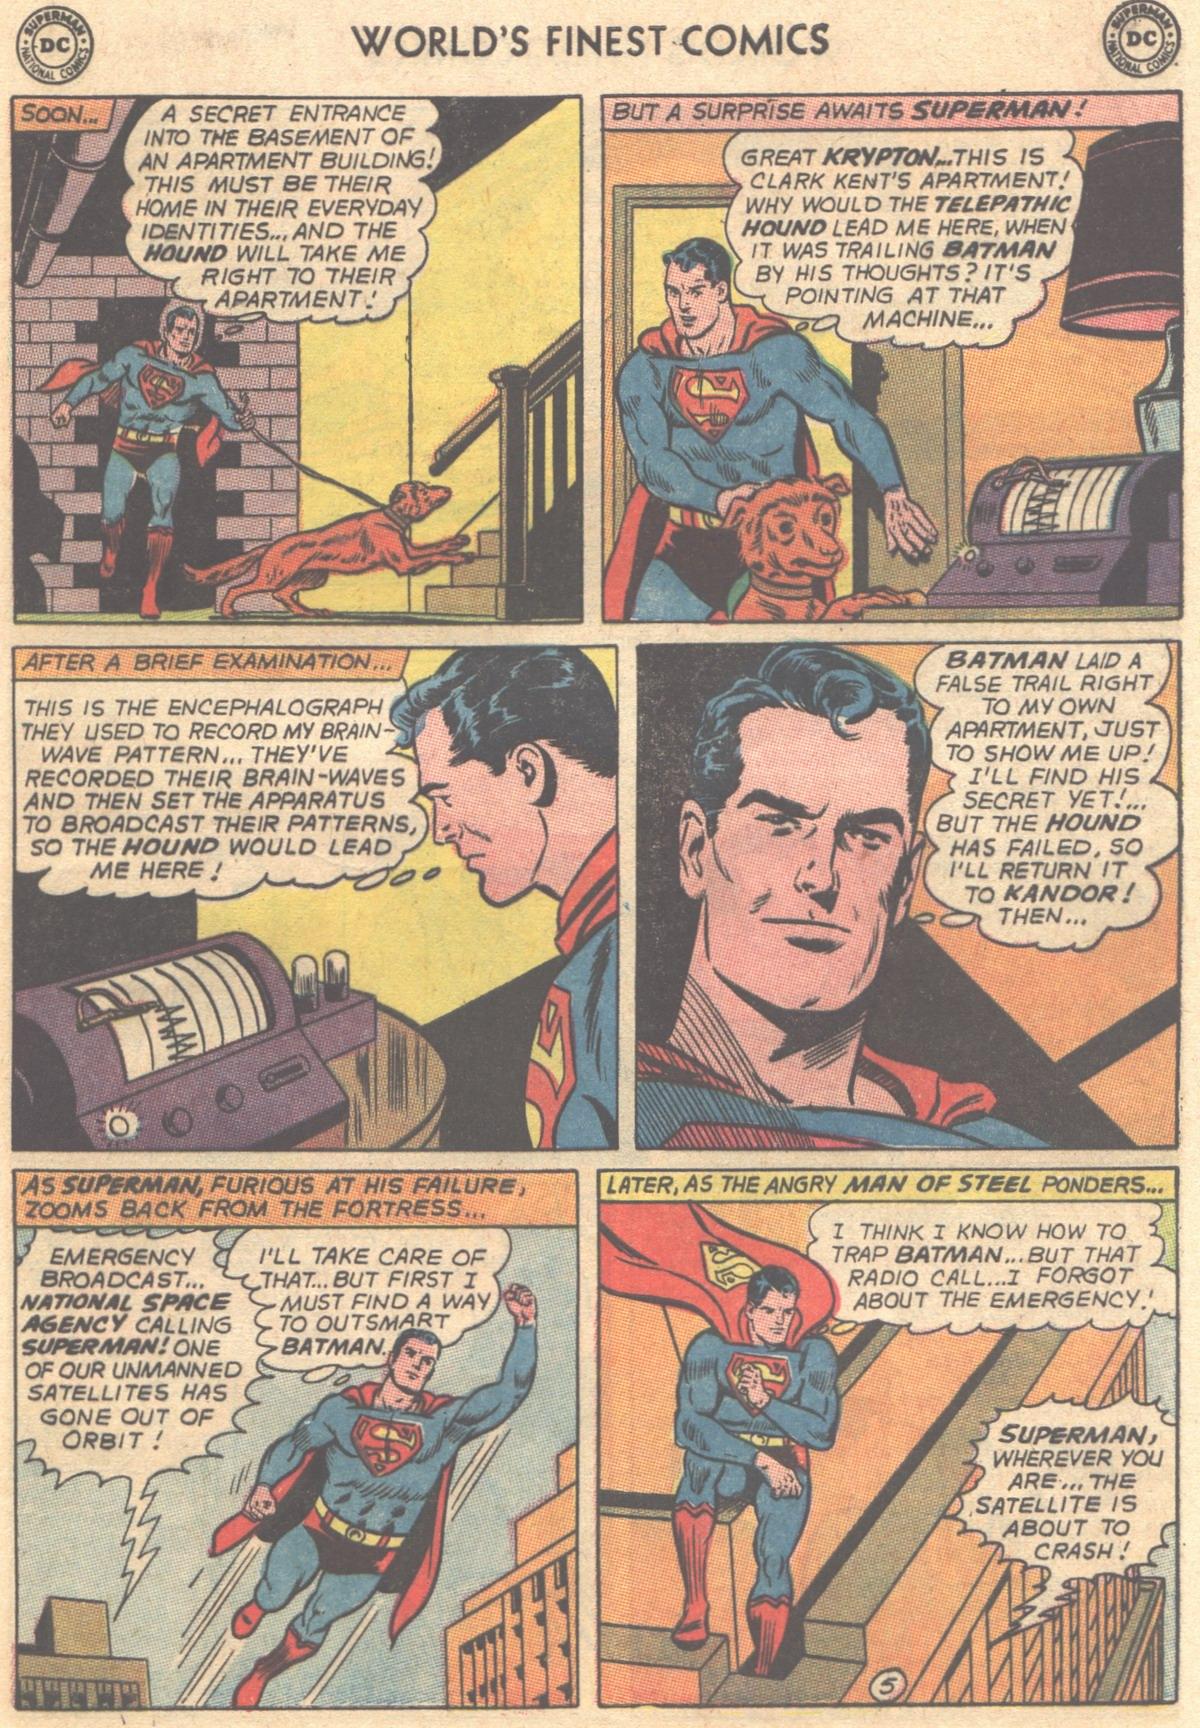 Read online World's Finest Comics comic -  Issue #149 - 21